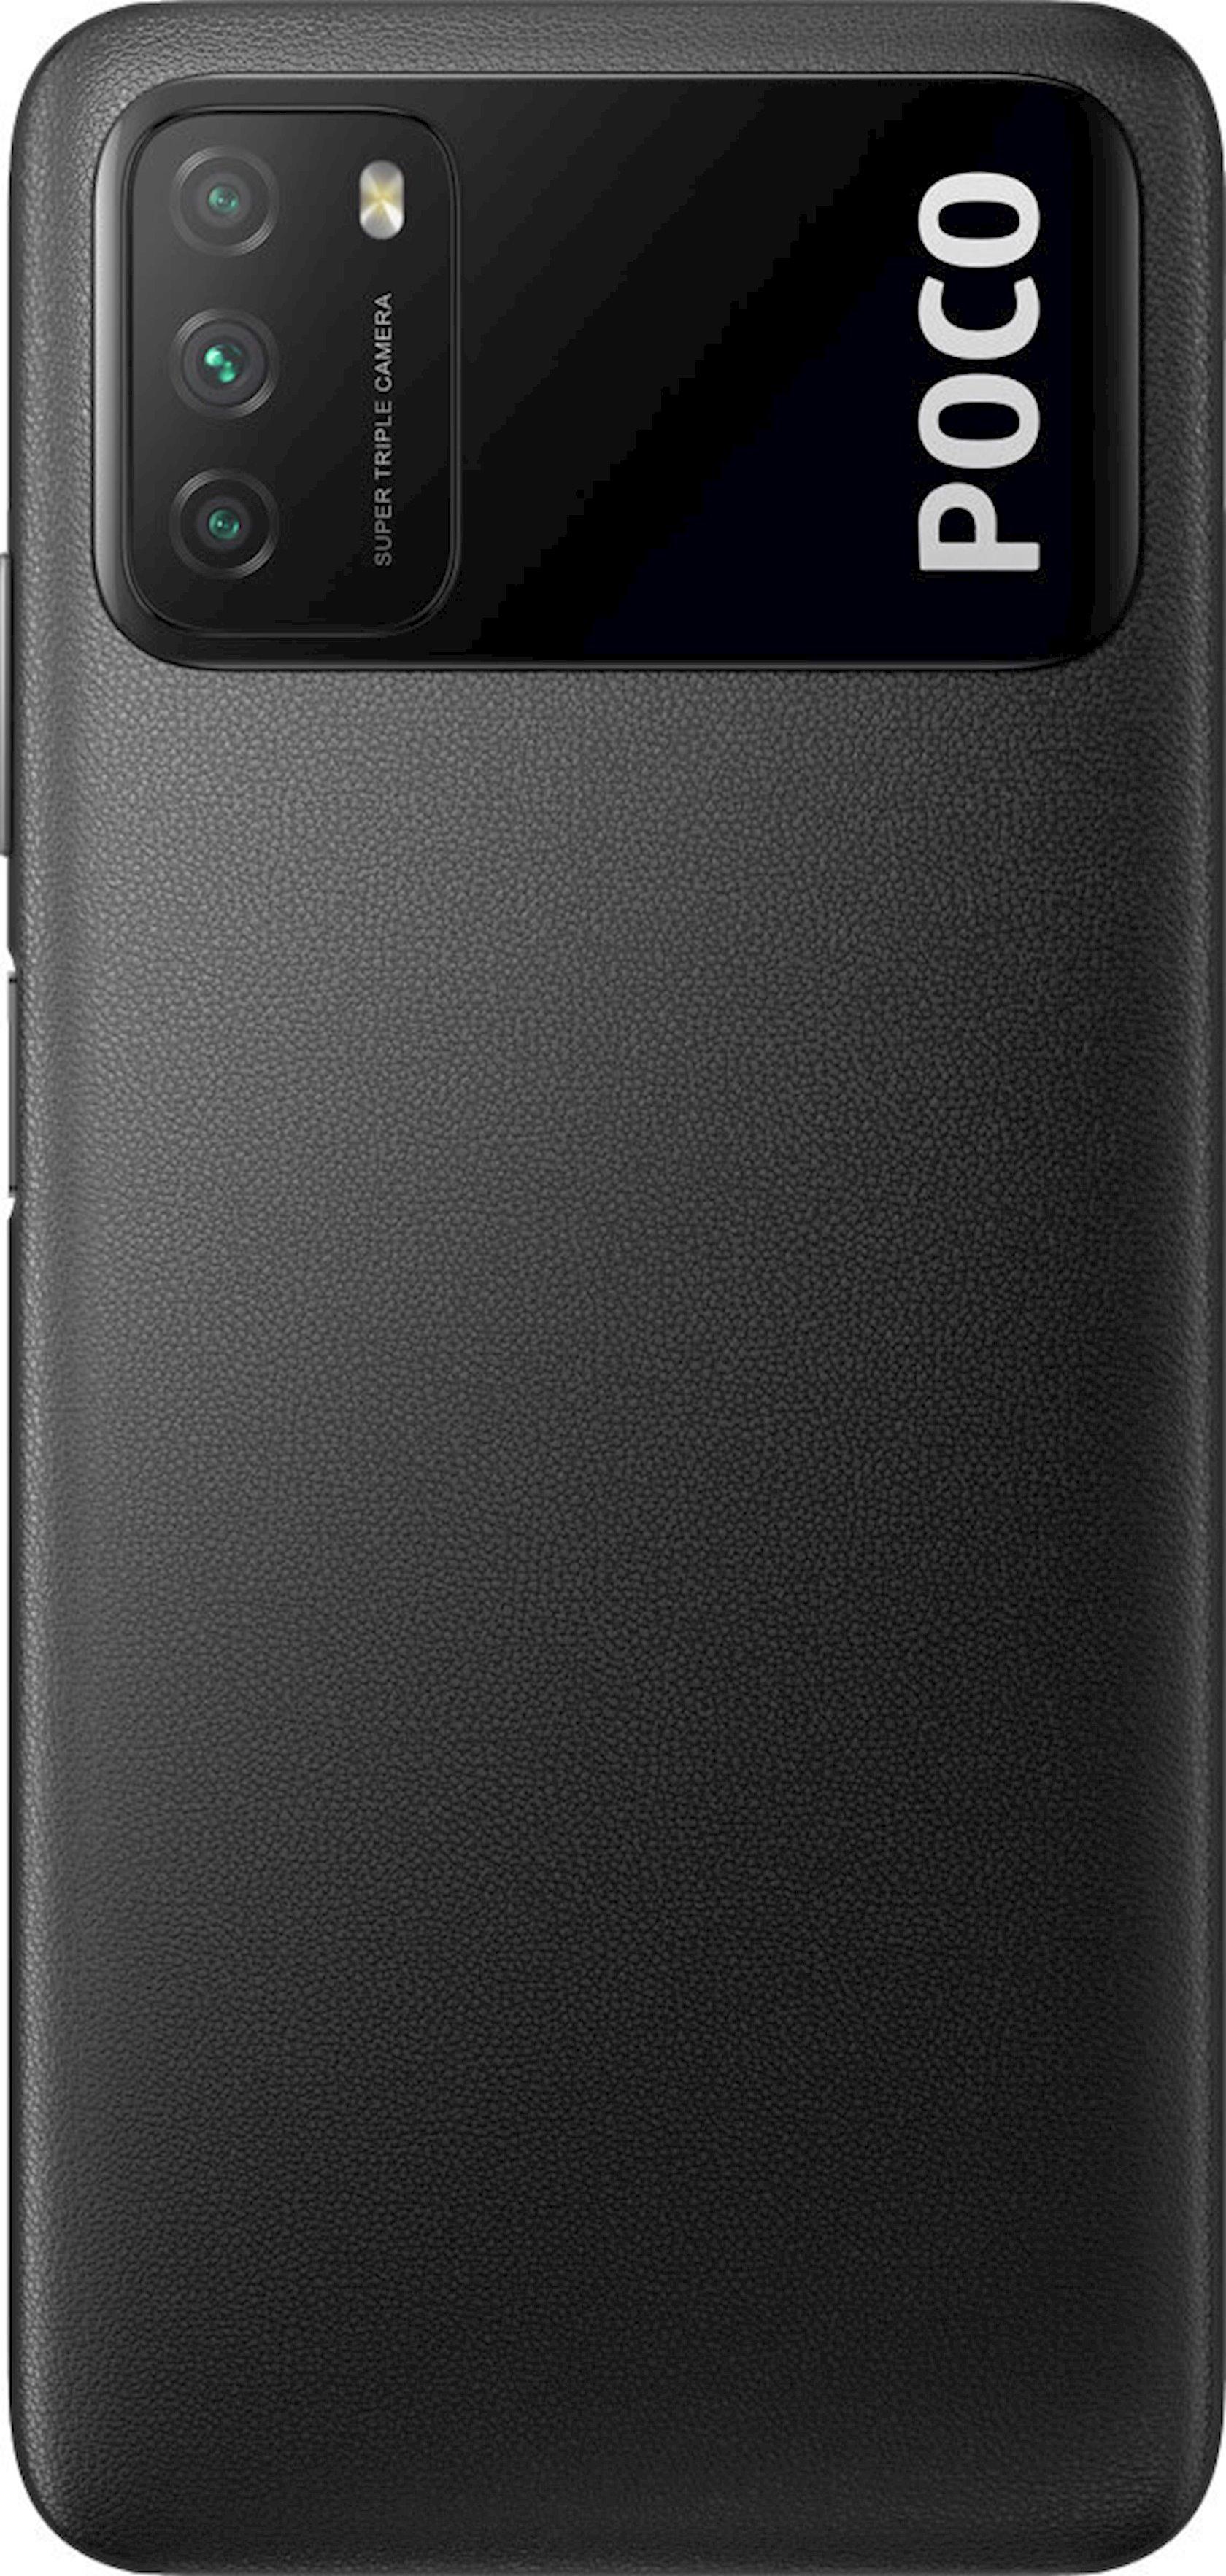 Smartfon Xiaomi Poco M3 4GB/128GB Power Black